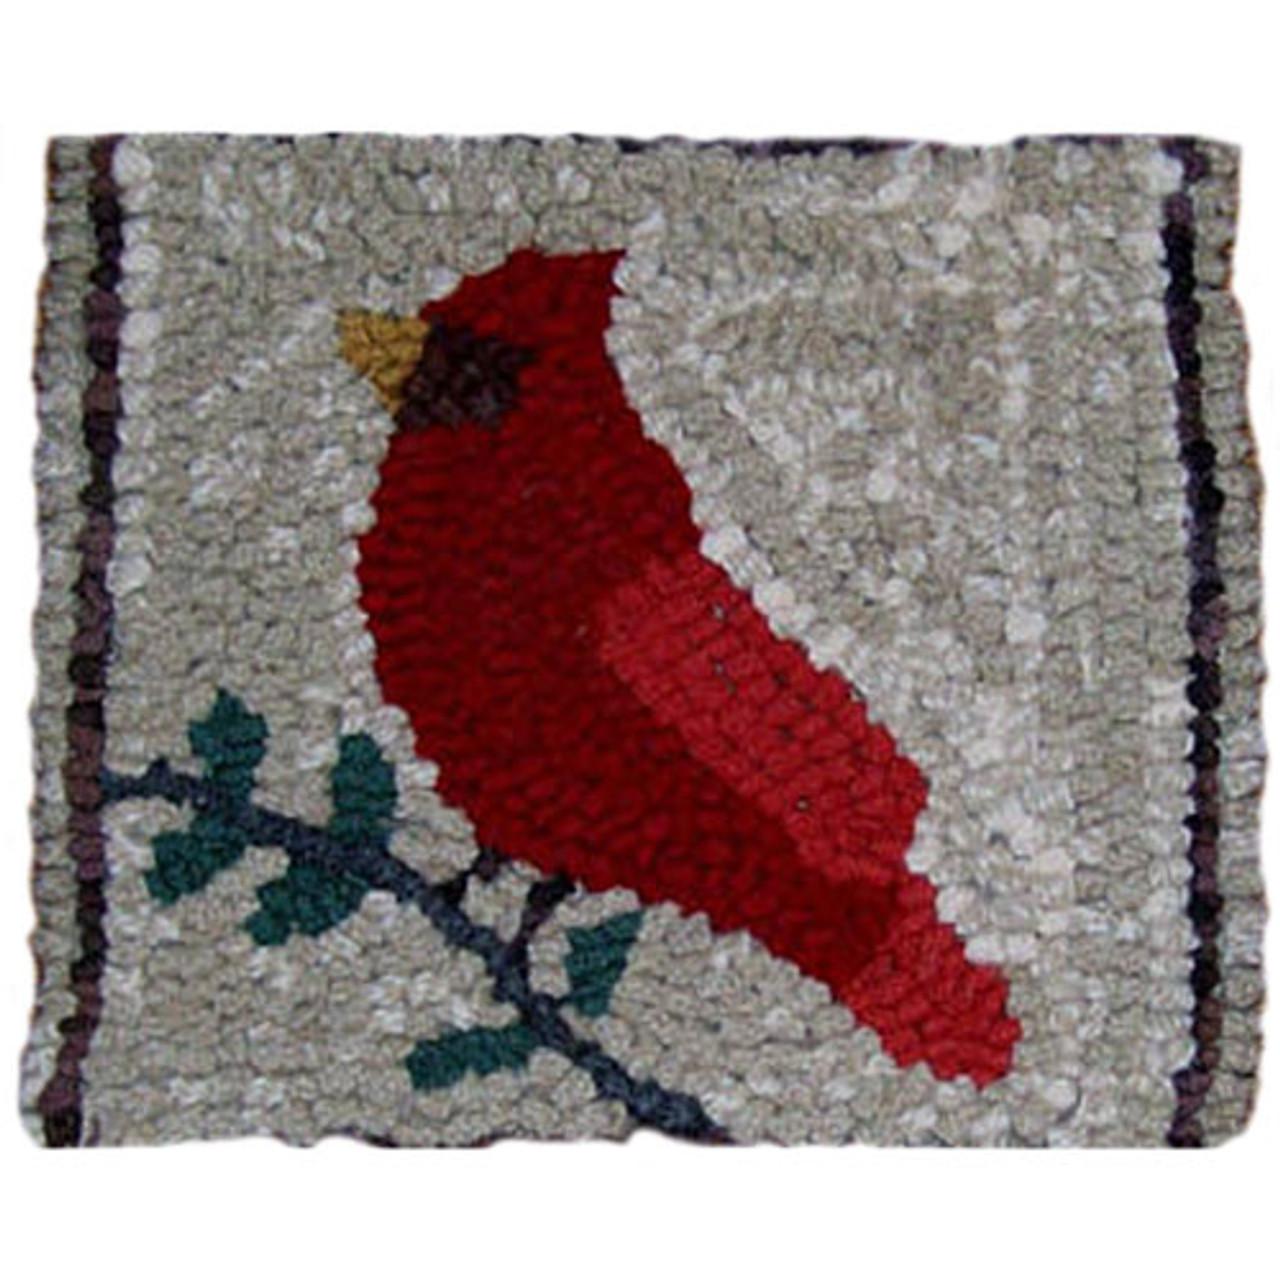 Beginner Rug Hooking Kit Cardinal On Oats